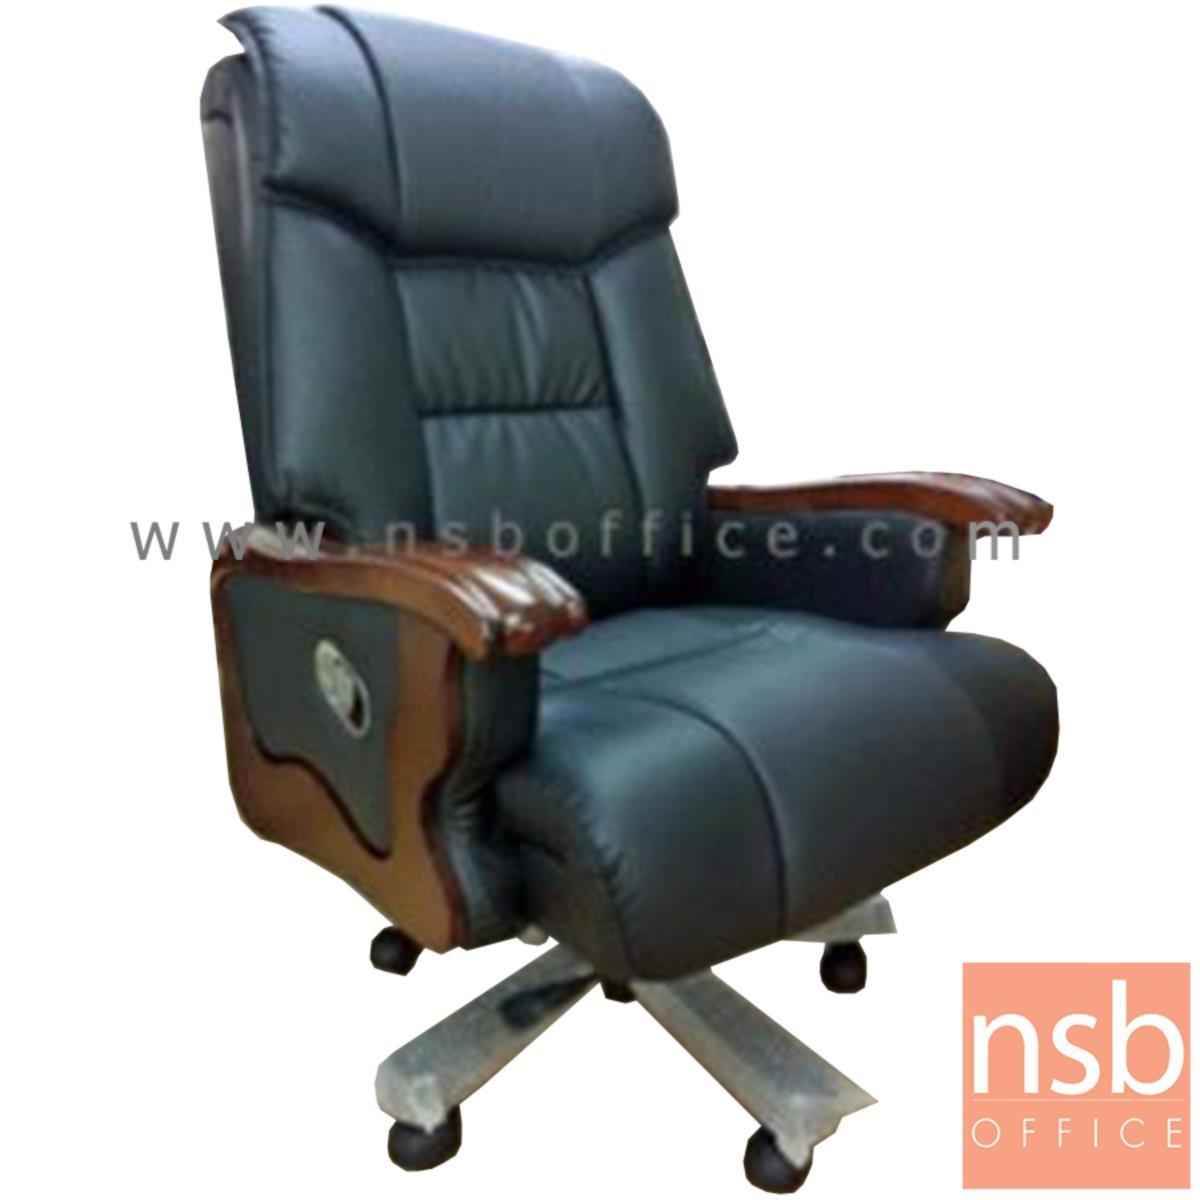 B25A064:เก้าอี้ผู้บริหารหนังแท้ รุ่น Patton (แพ็ทตัน)  โช๊คแก๊ส มีก้อนโยก ขาไม้